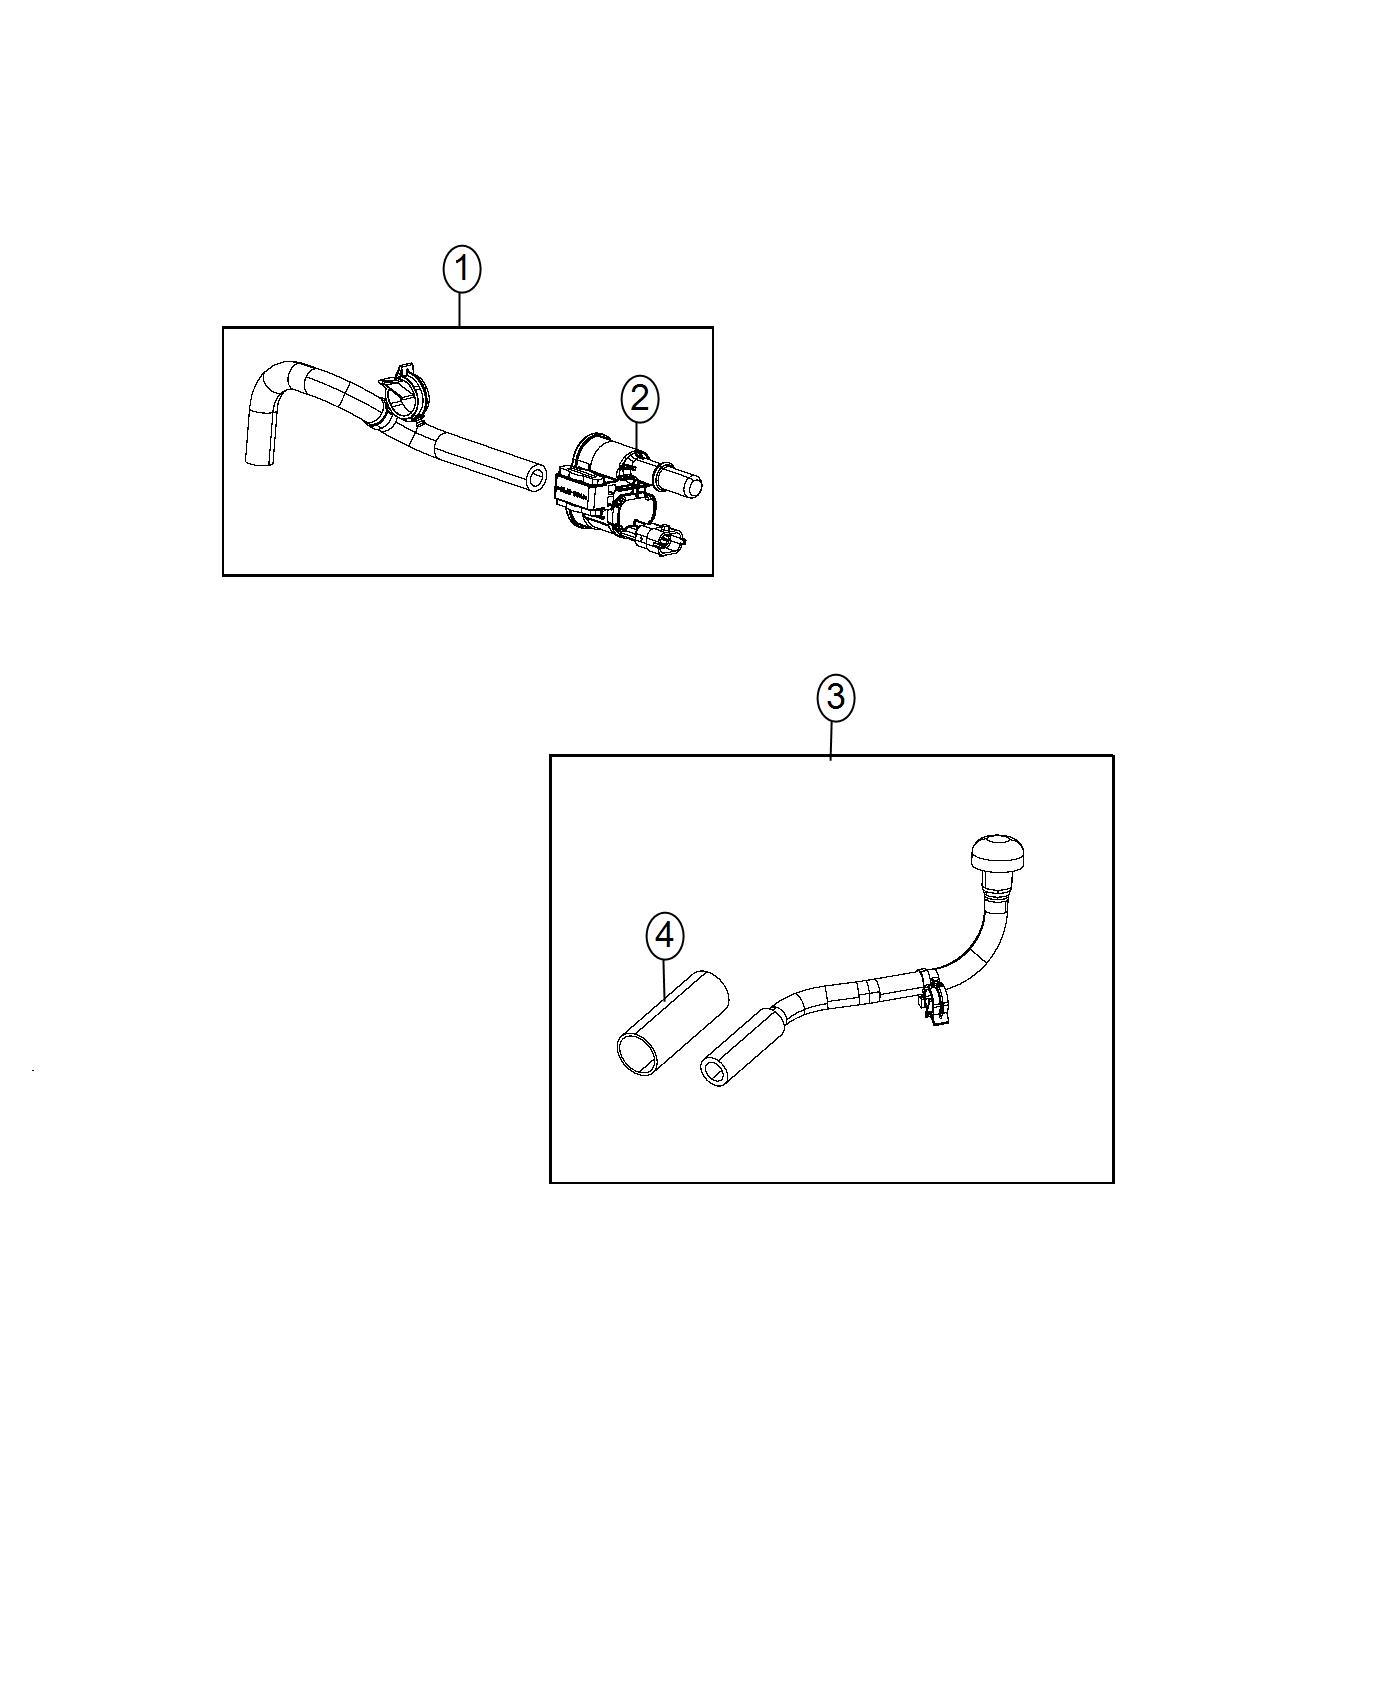 Ram Sleeve Fuel Bundle 6 Spd Auto Aisin As66rc Hd Trans 6 Spd Automatic